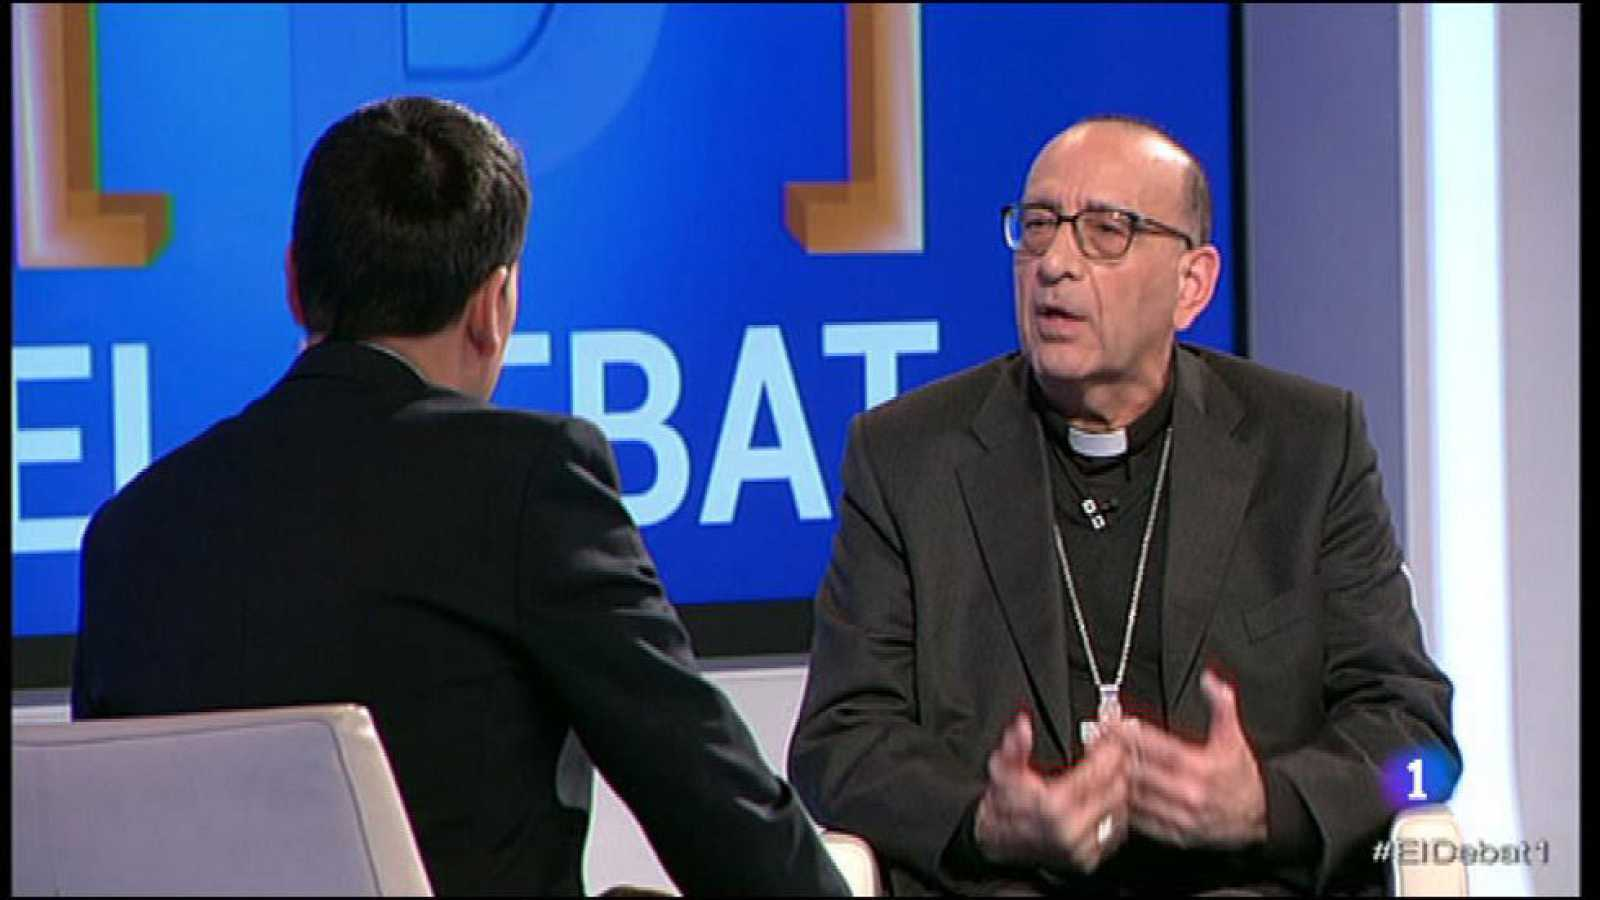 El Debate de La 1 - Juan José Omella